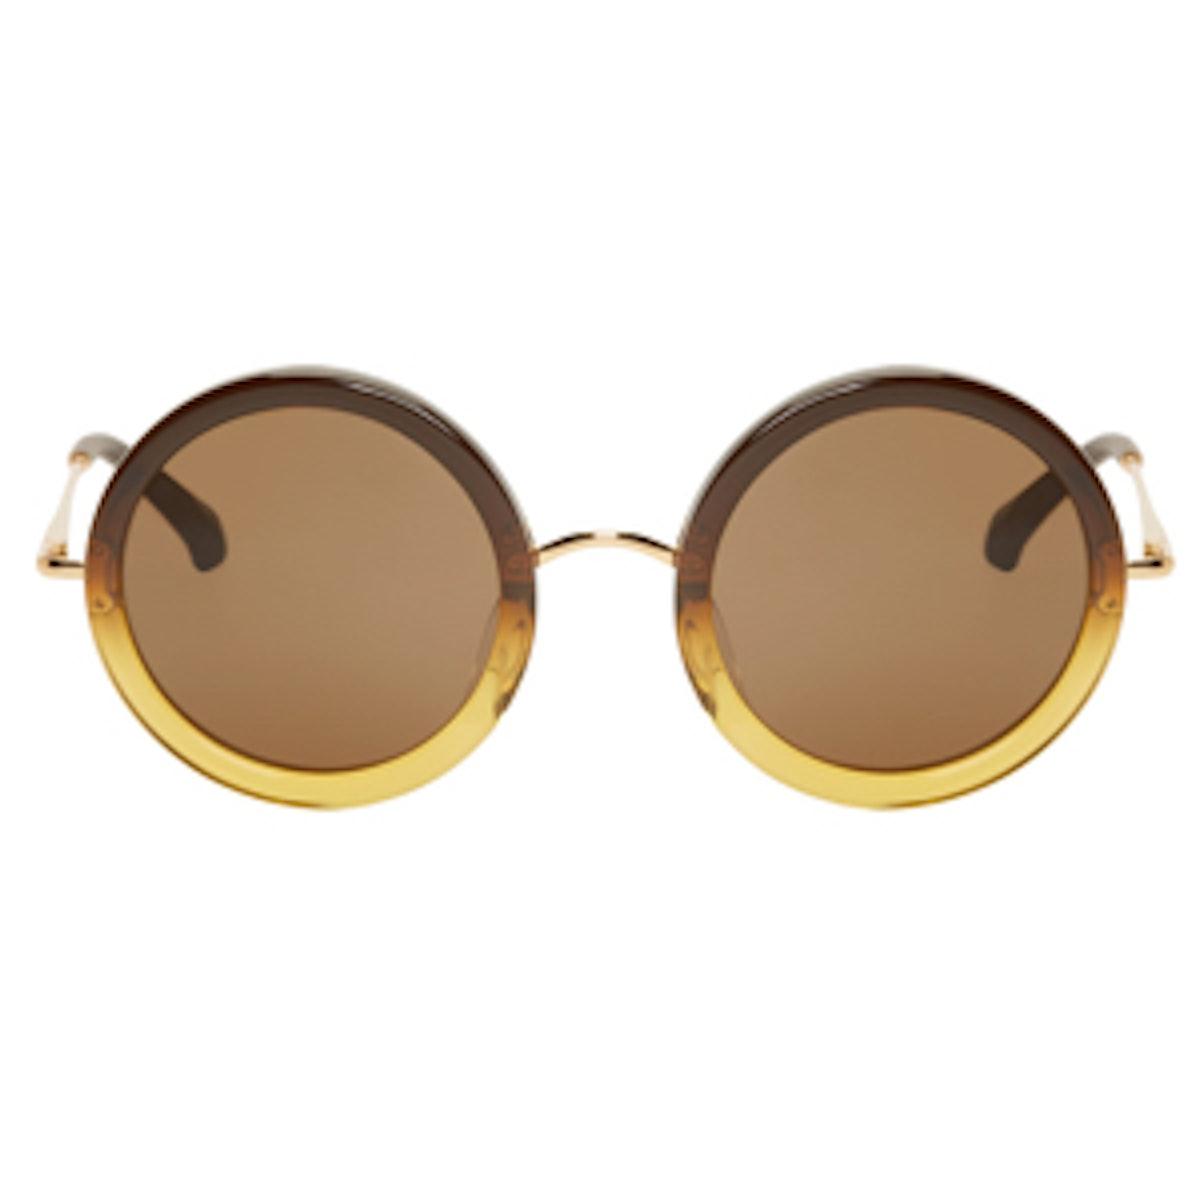 Ochre Gradient Round Sunglasses